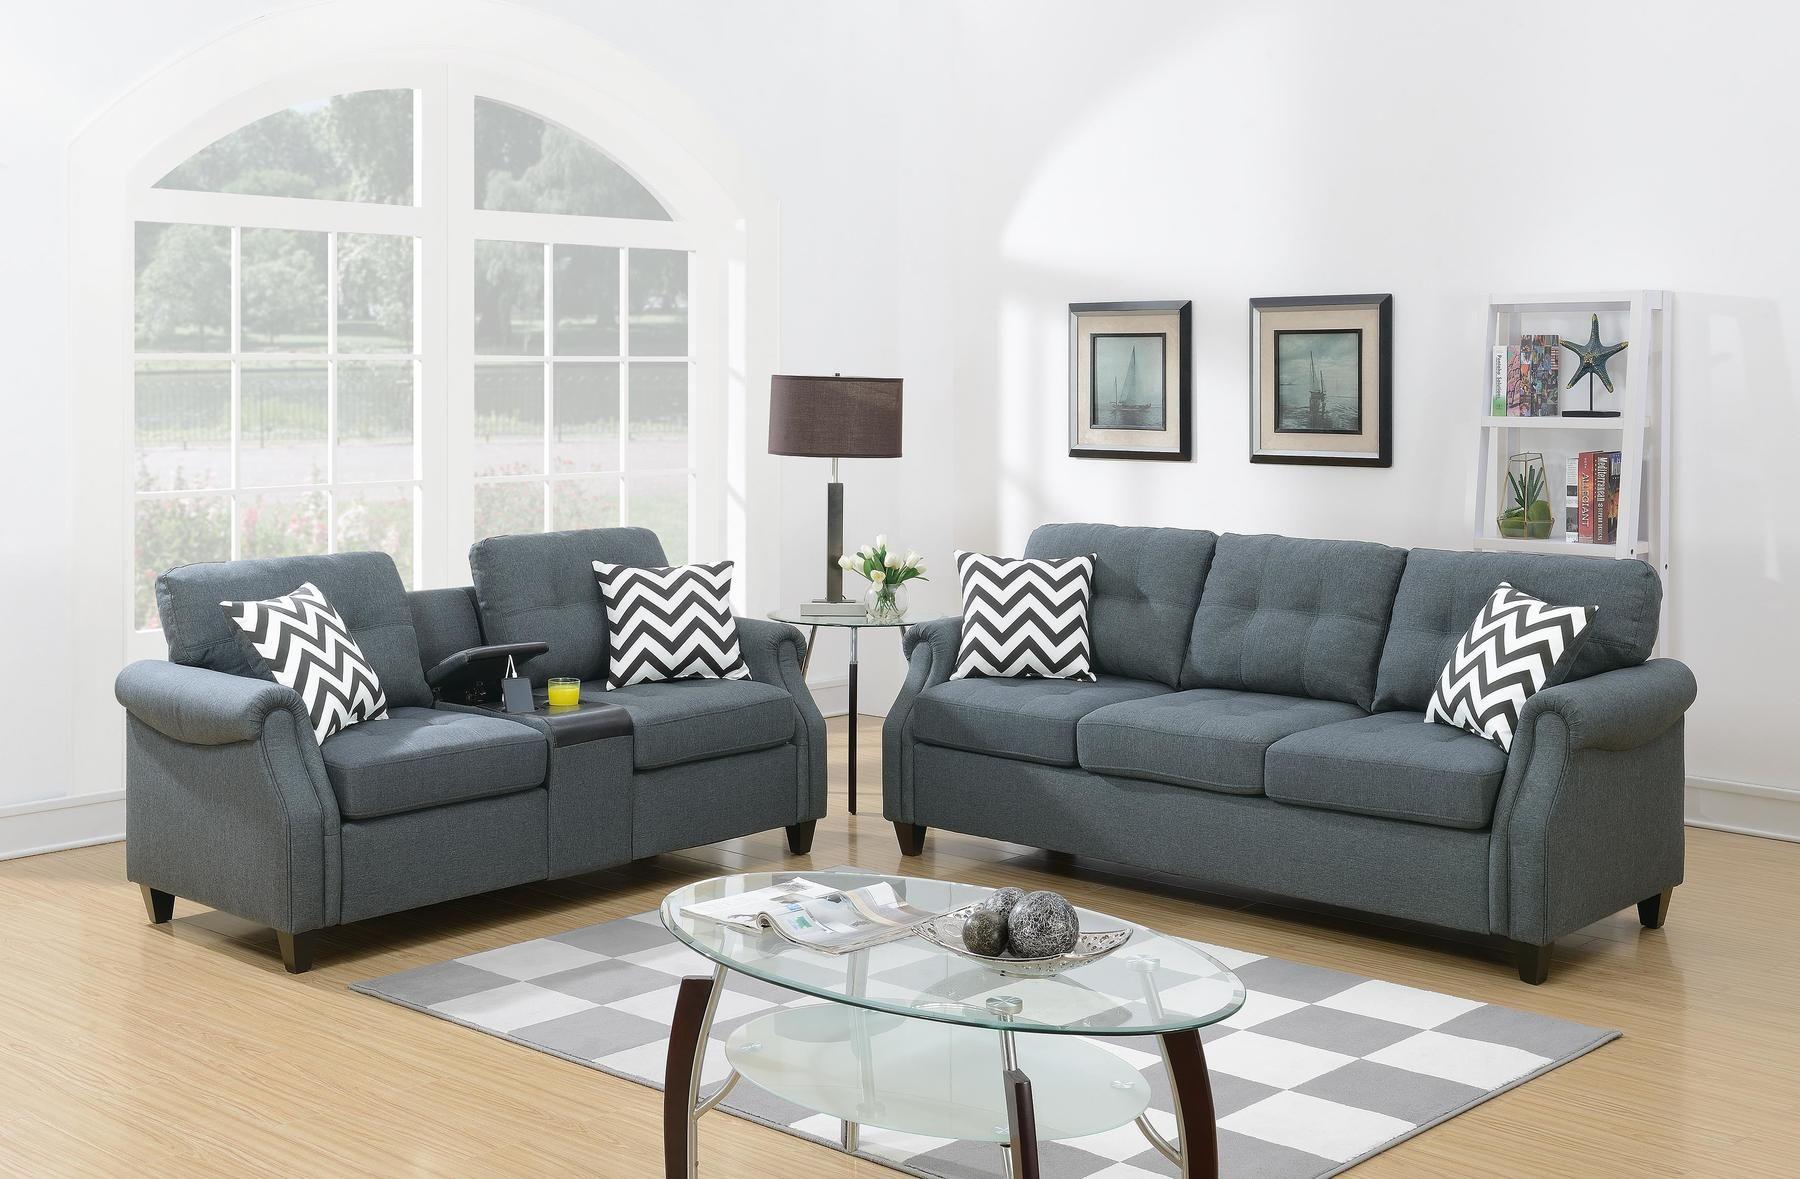 Sofa Loveseat Set